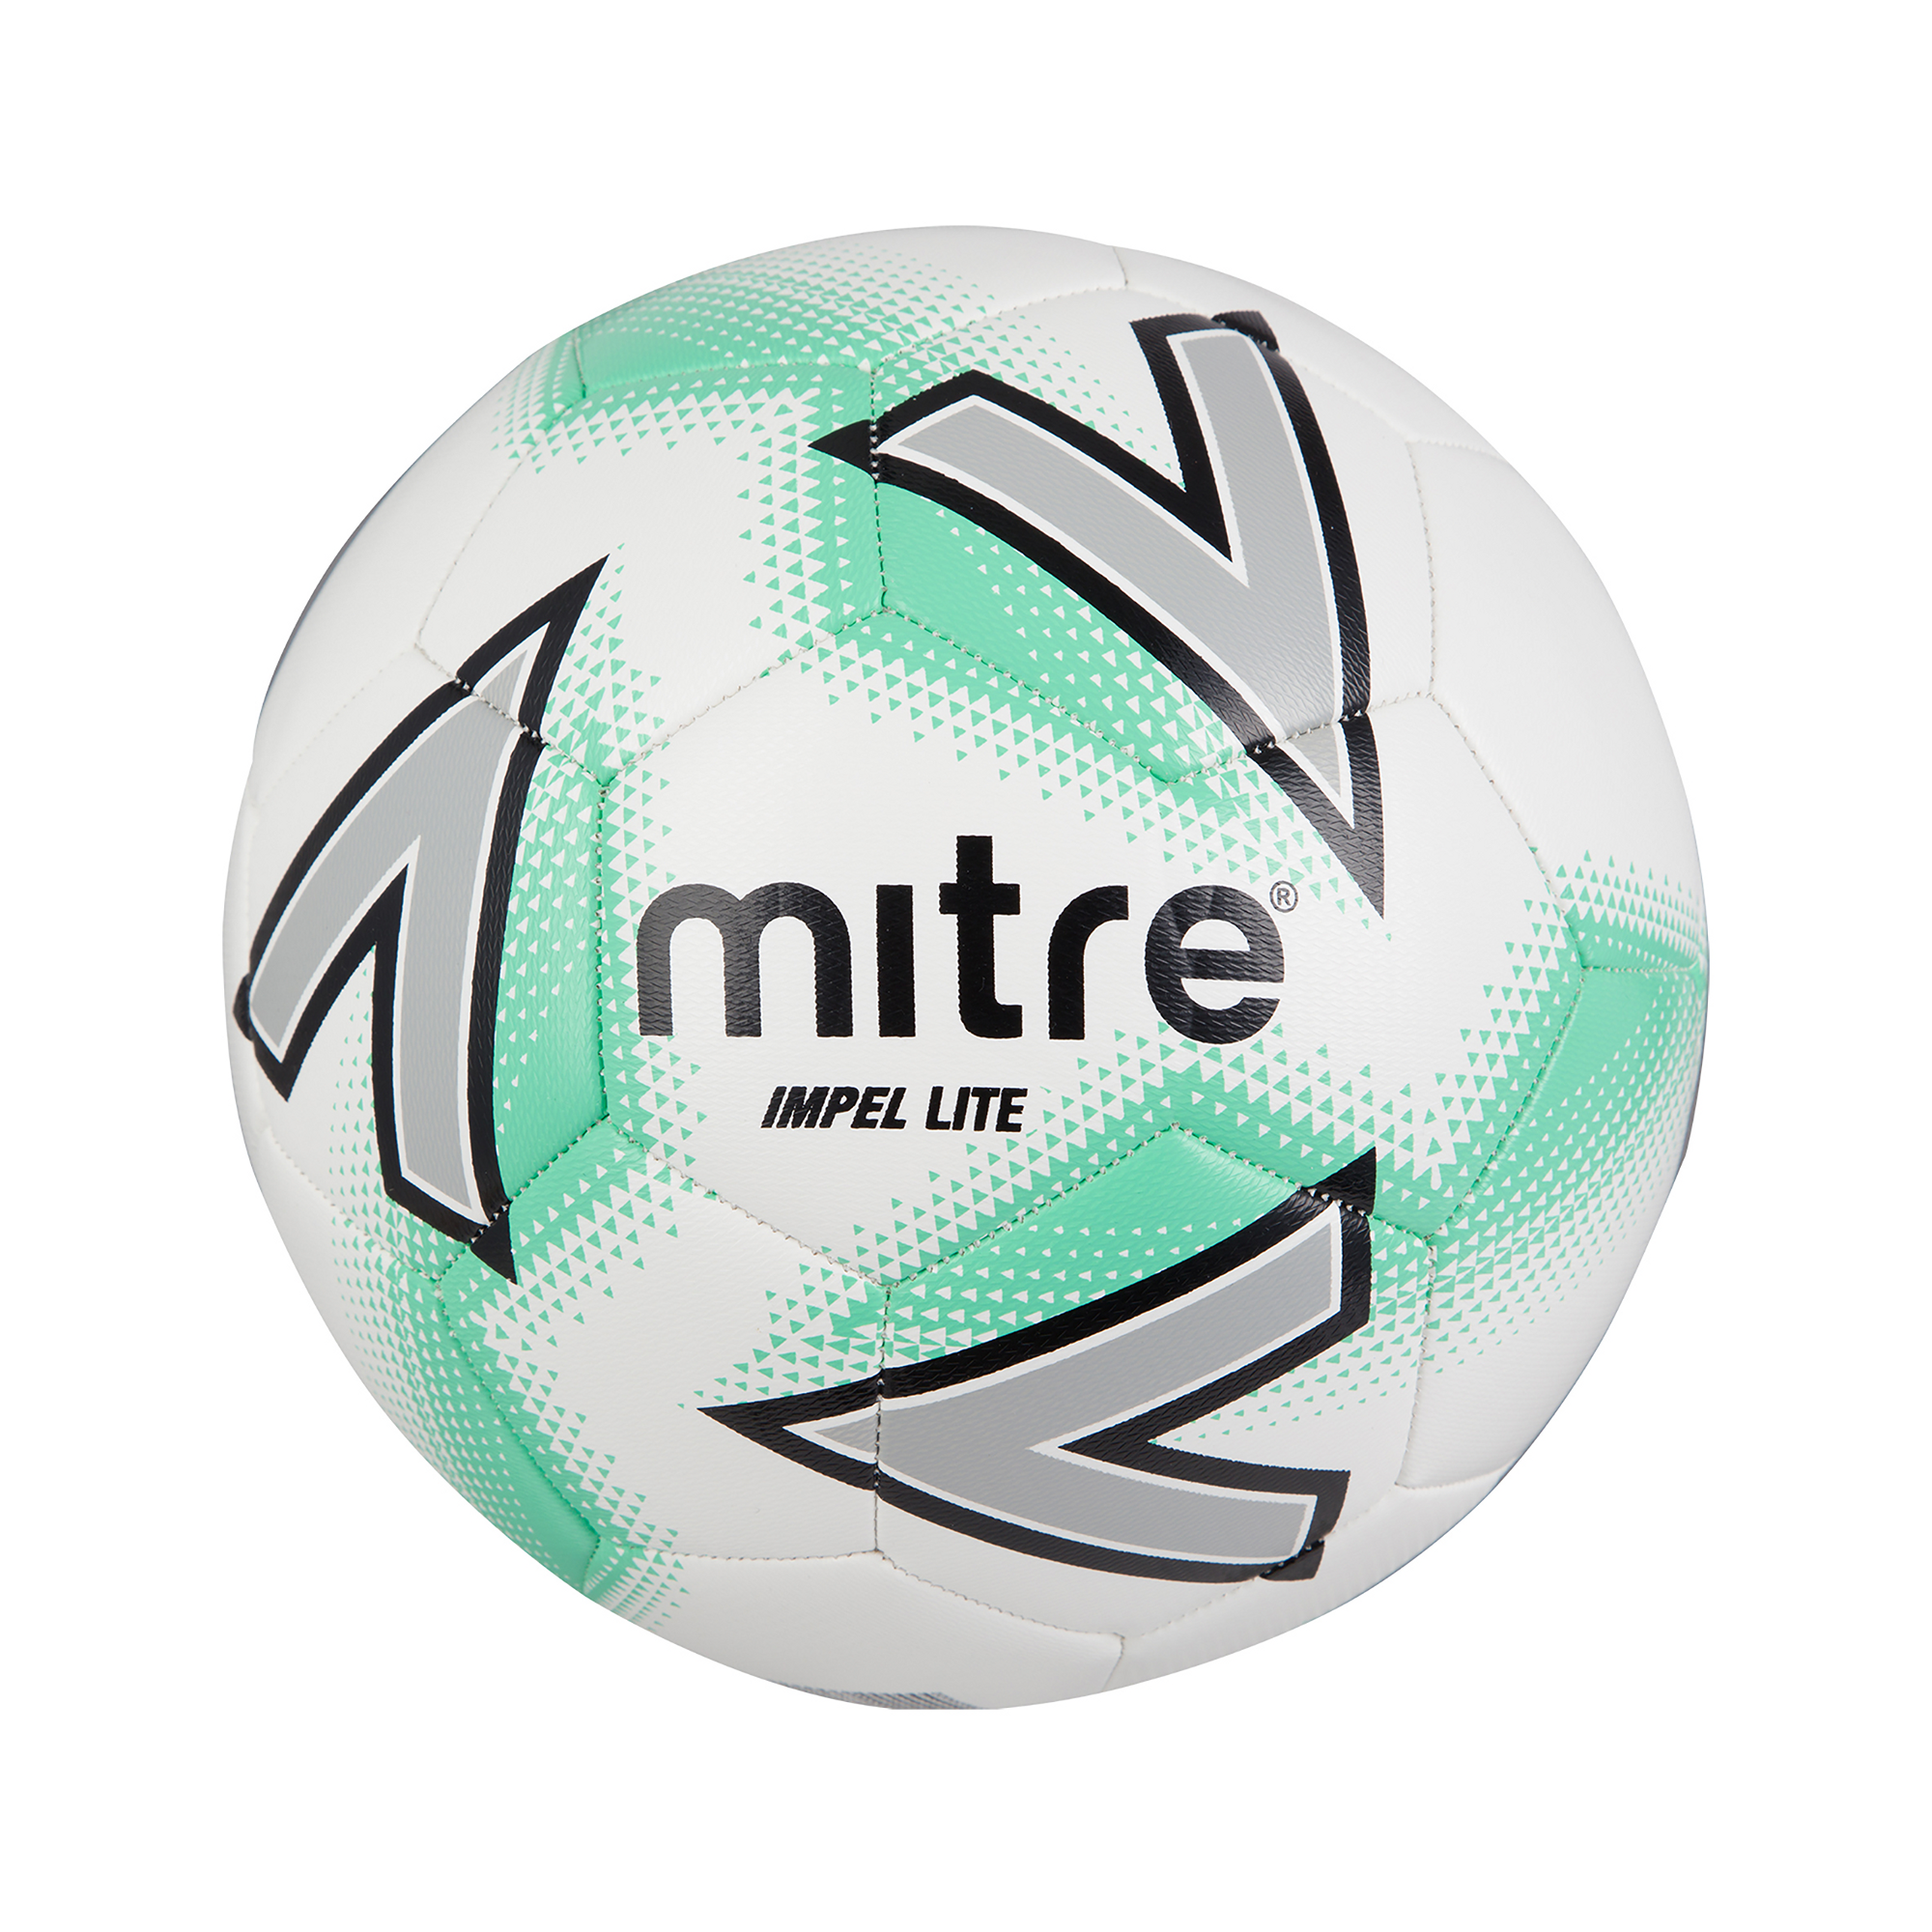 acaf9eccf1b Mitre Impel Lite 360 Football - Size 5 - White Green